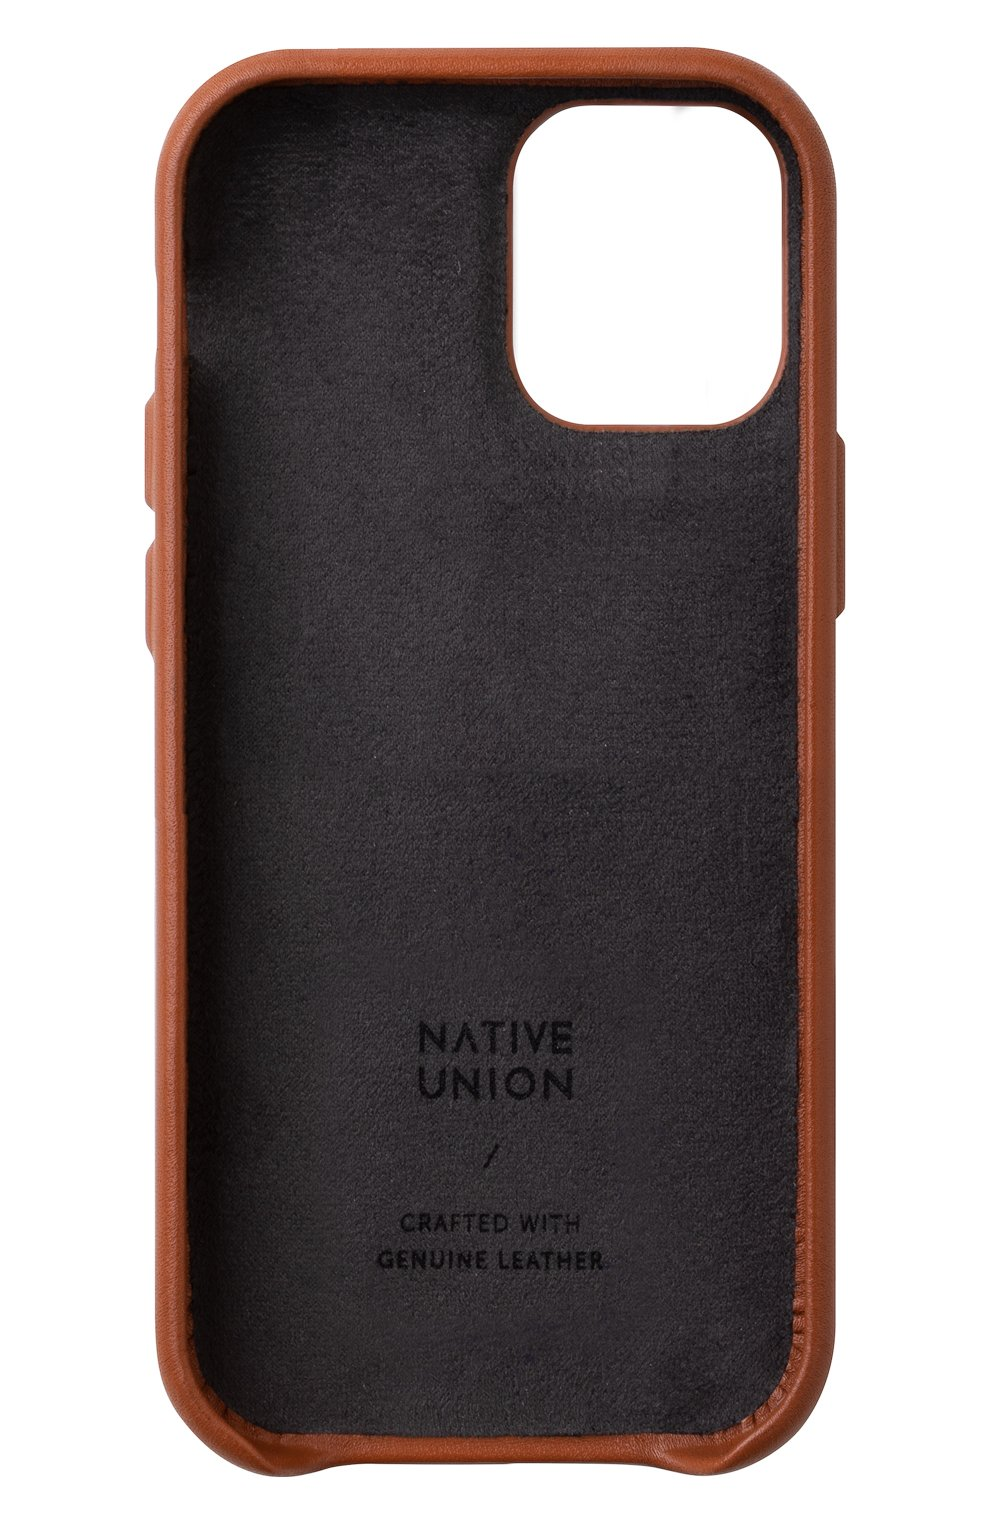 Чехол clic card для iphone 12 mini NATIVE UNION коричневого цвета, арт. CCARD-TAN-NP20S   Фото 2